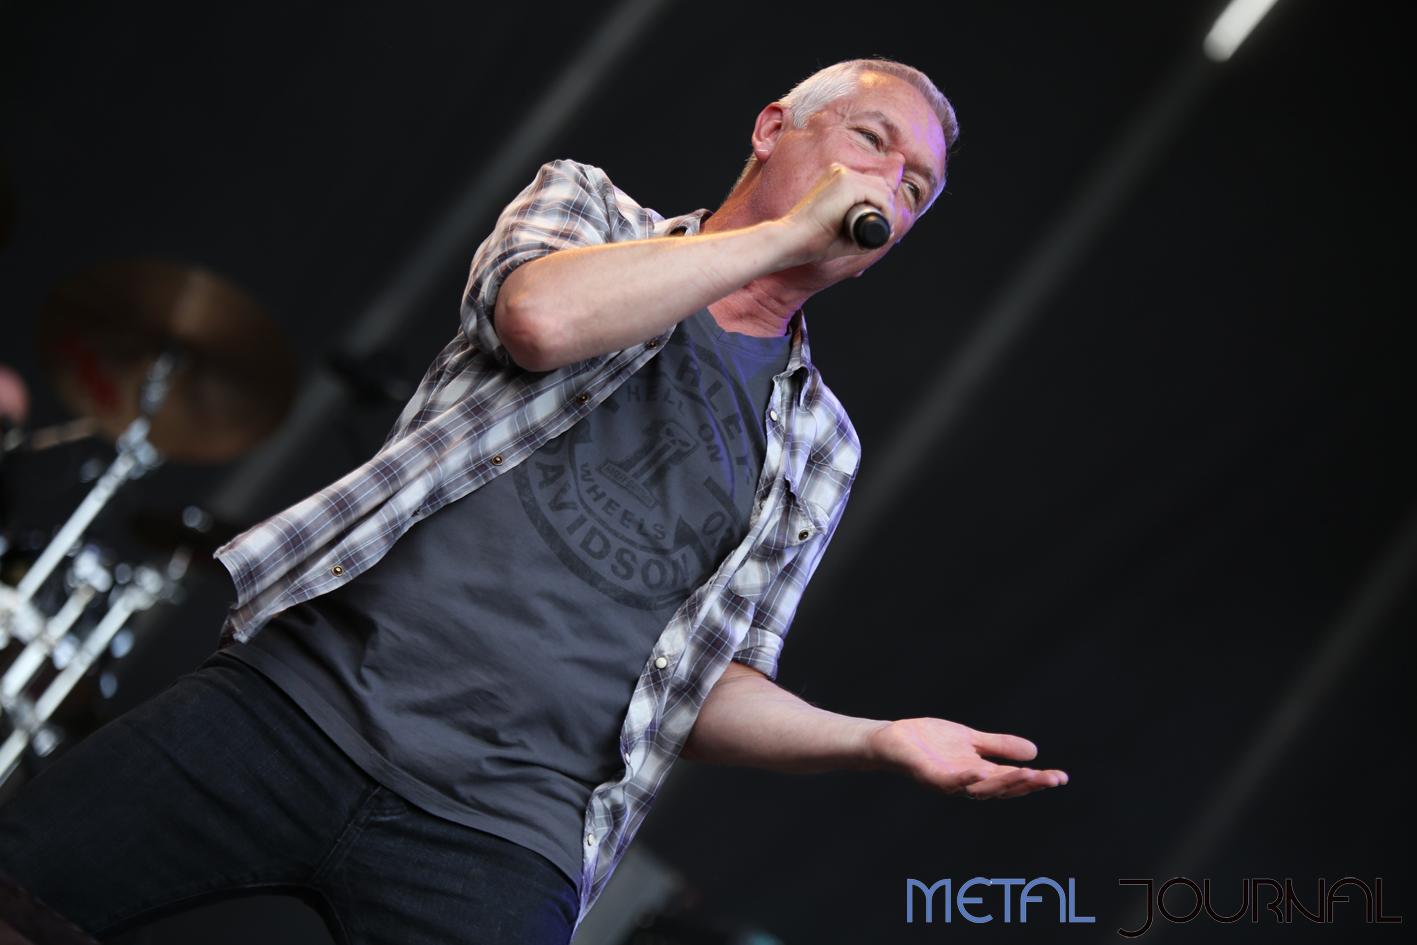 thunder - leyendas del rock 2018 pic 1